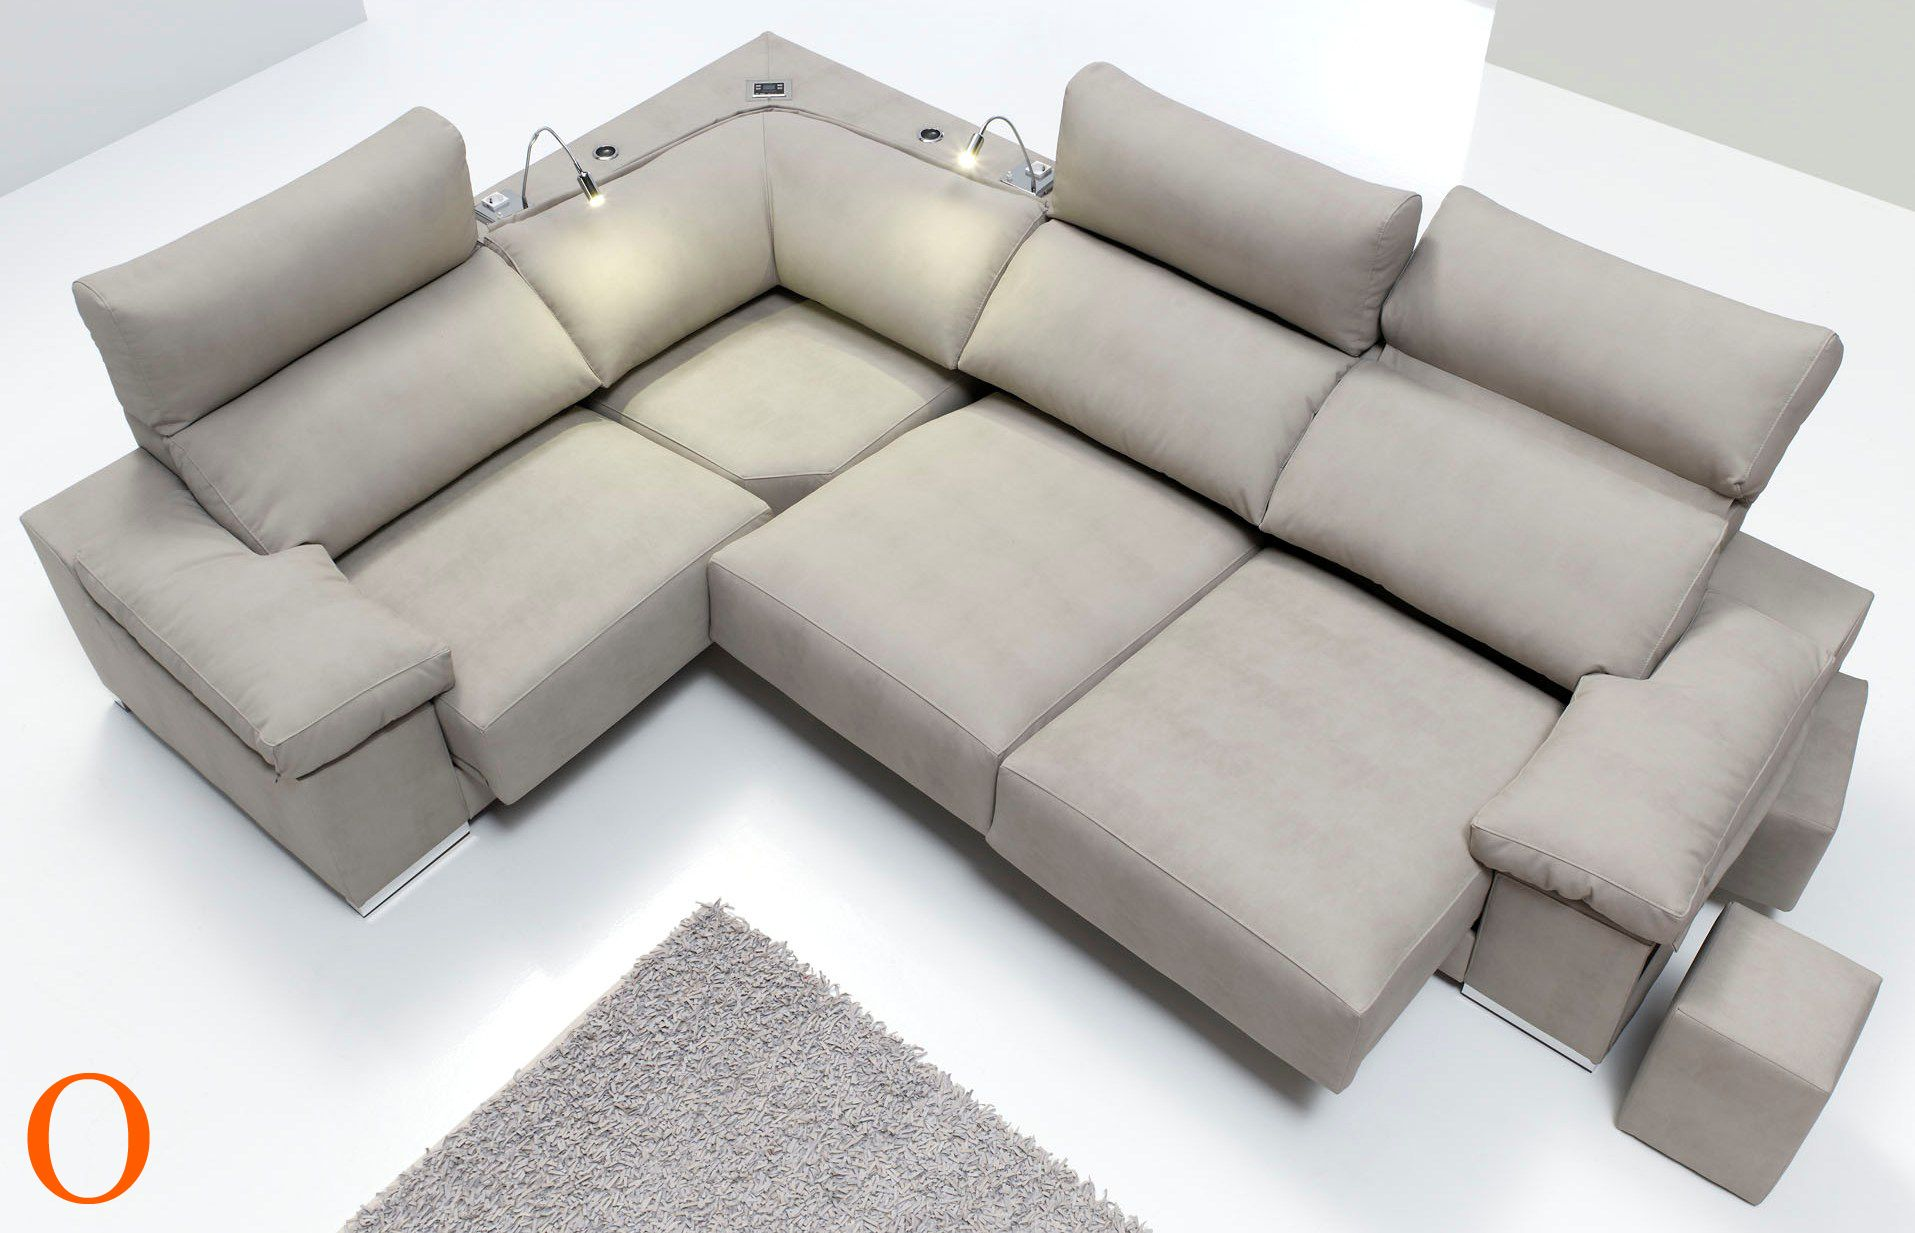 Rinconera de 2 60 x 2 20 Respaldos reclinables 2 asientos